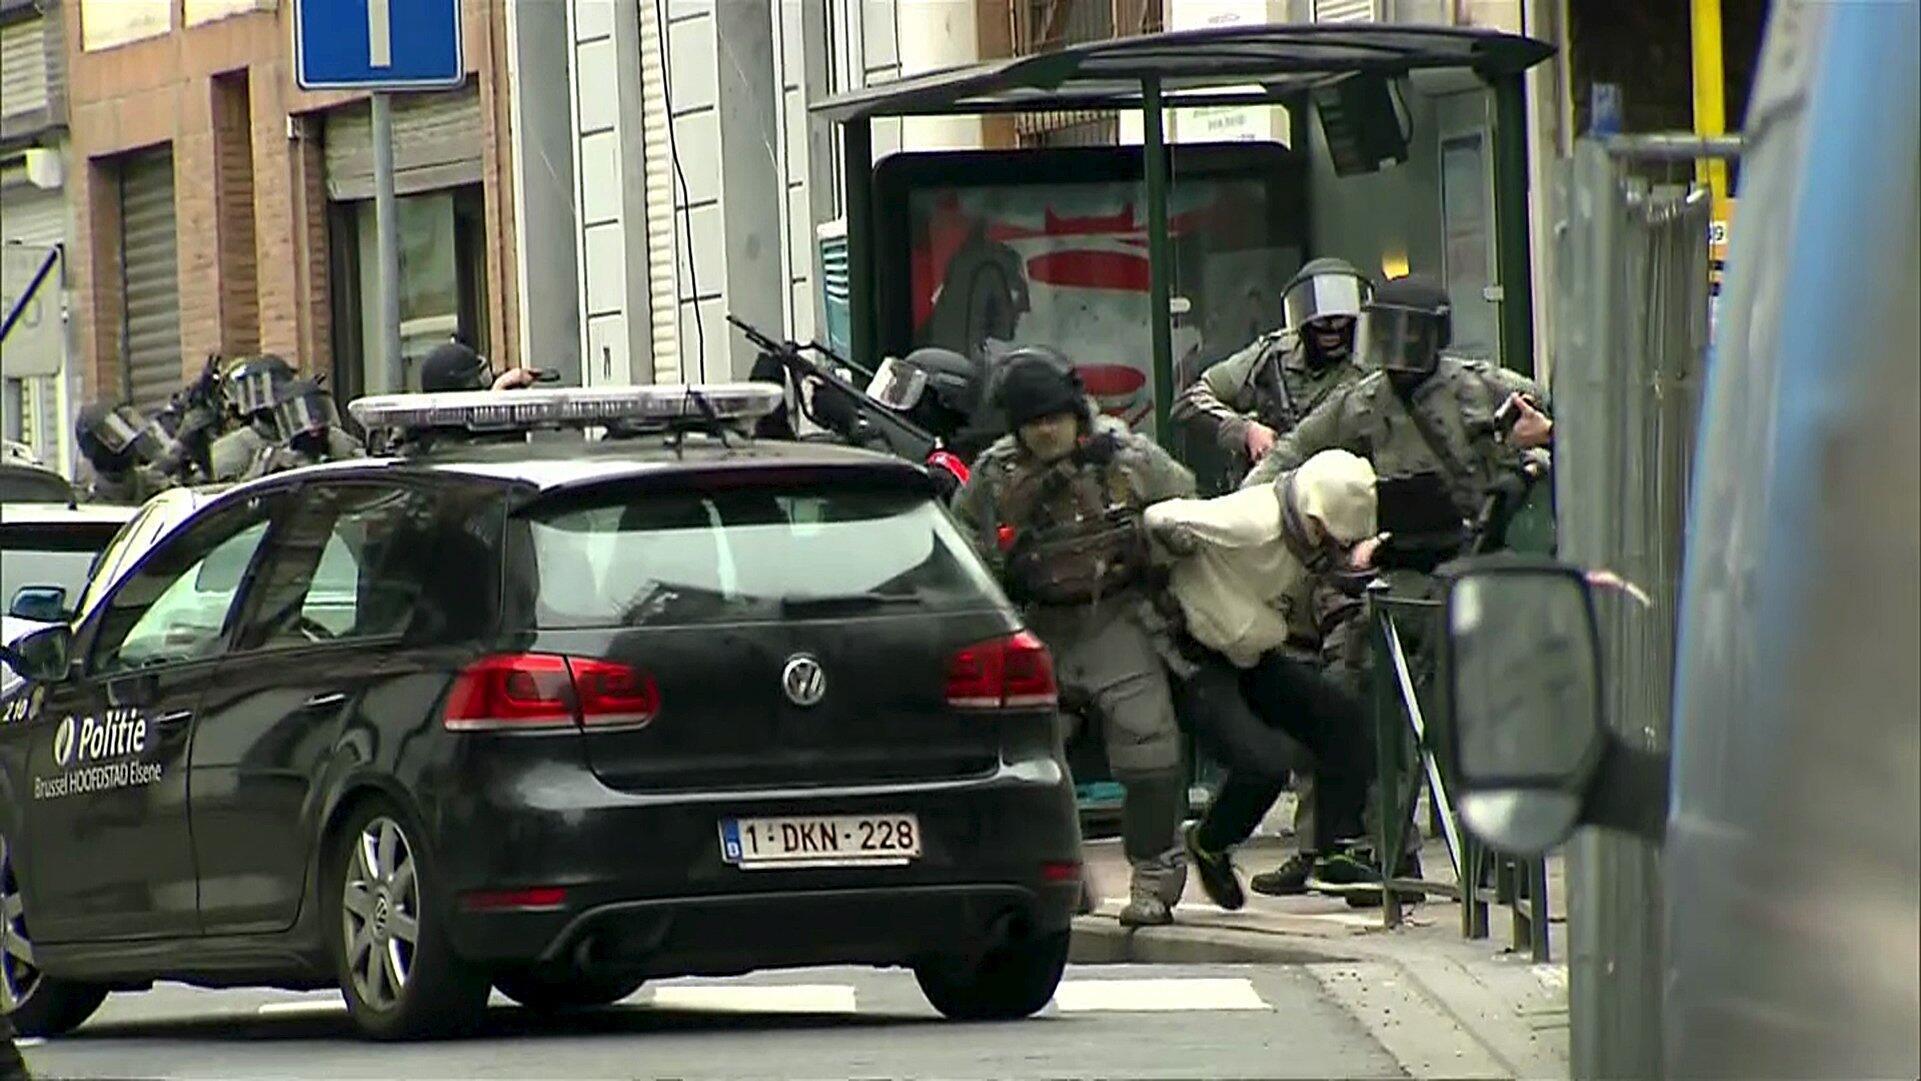 Belgian police arrest Salah Abdeslam, 18 March 2016, in the Molenbeek quarter of Brussels.